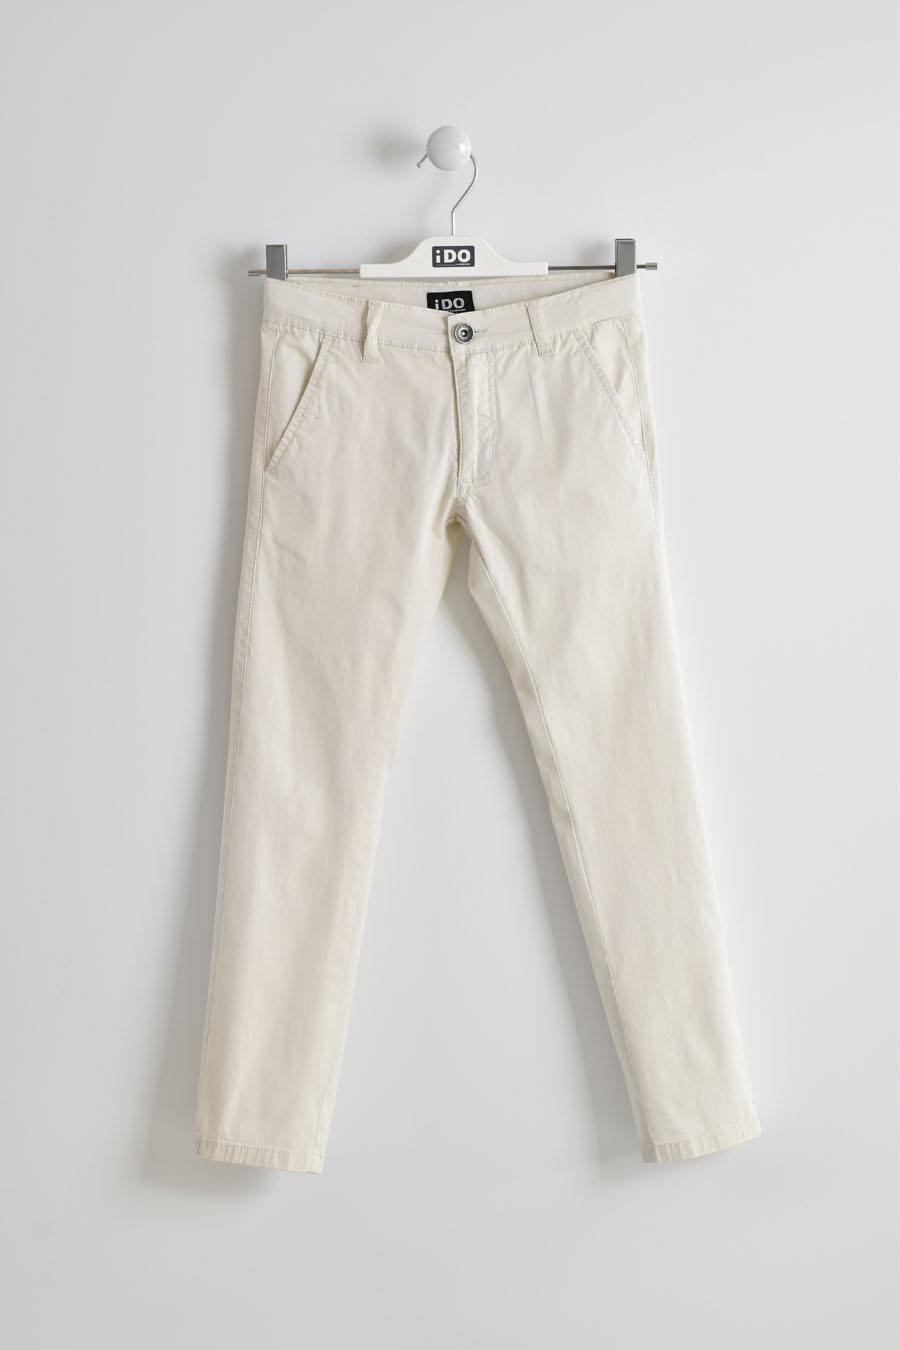 bézs drapp fiú nadrág